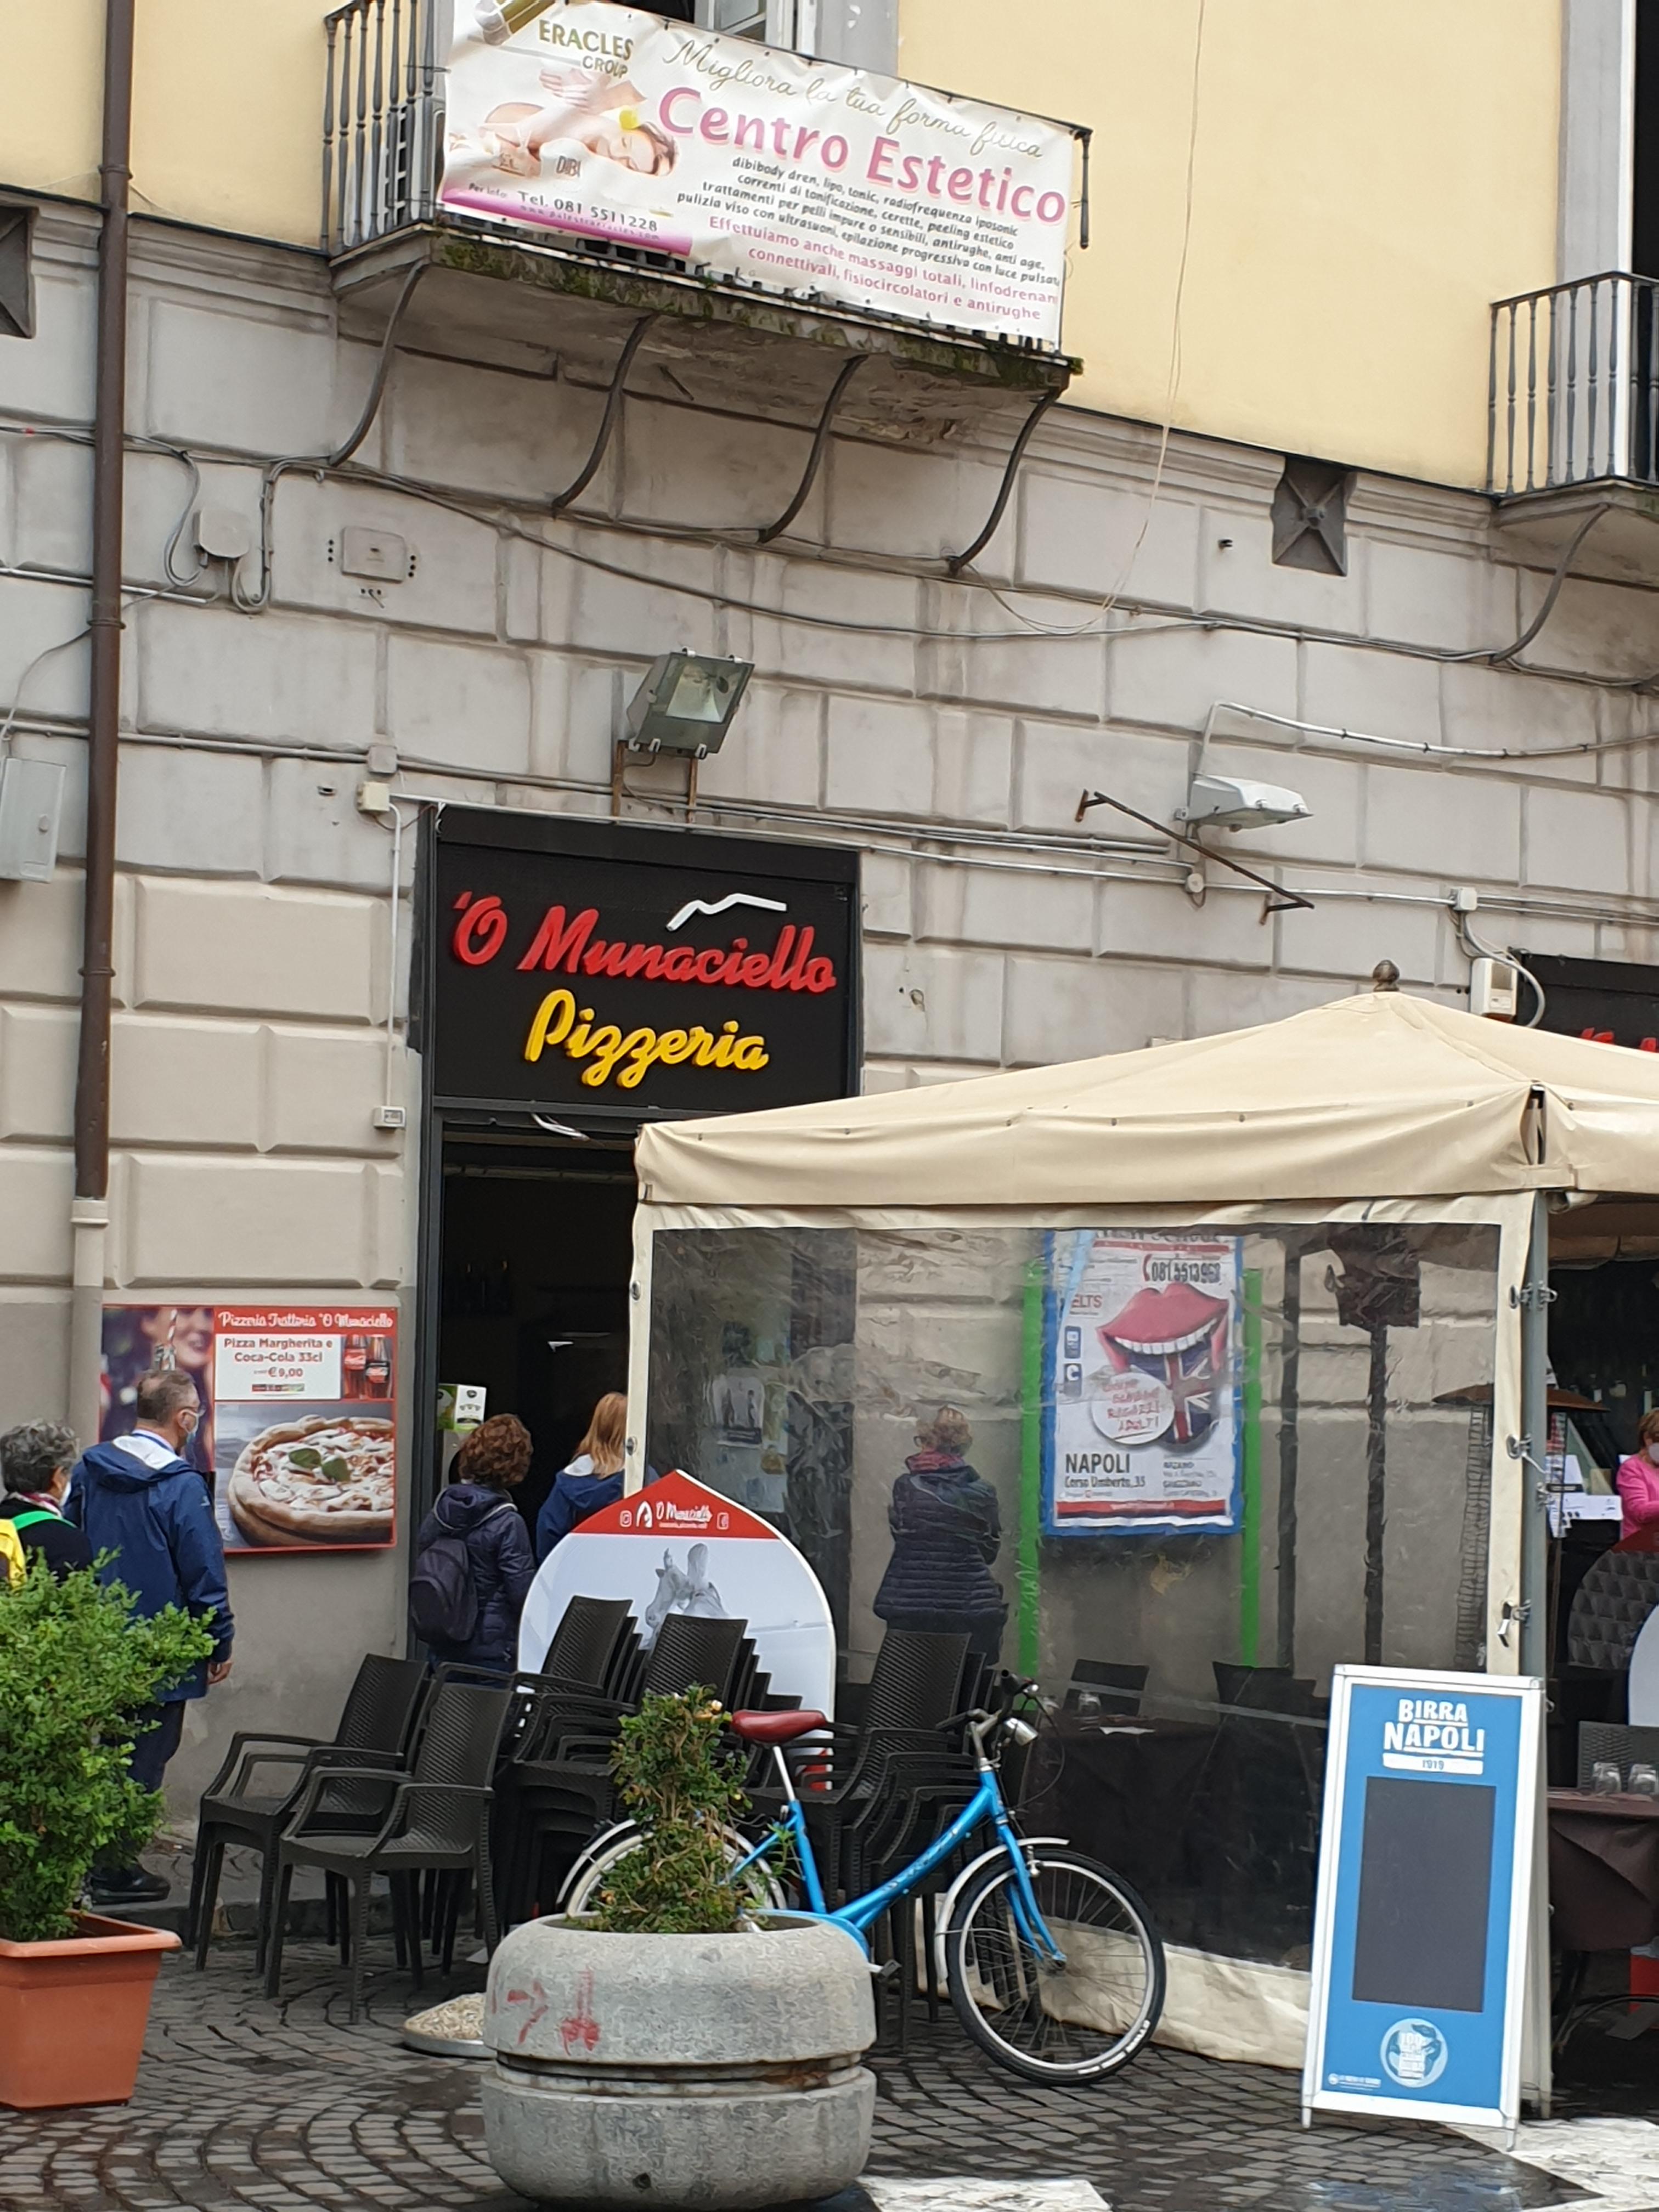 Pizzeria 'O Munaciello Napoli